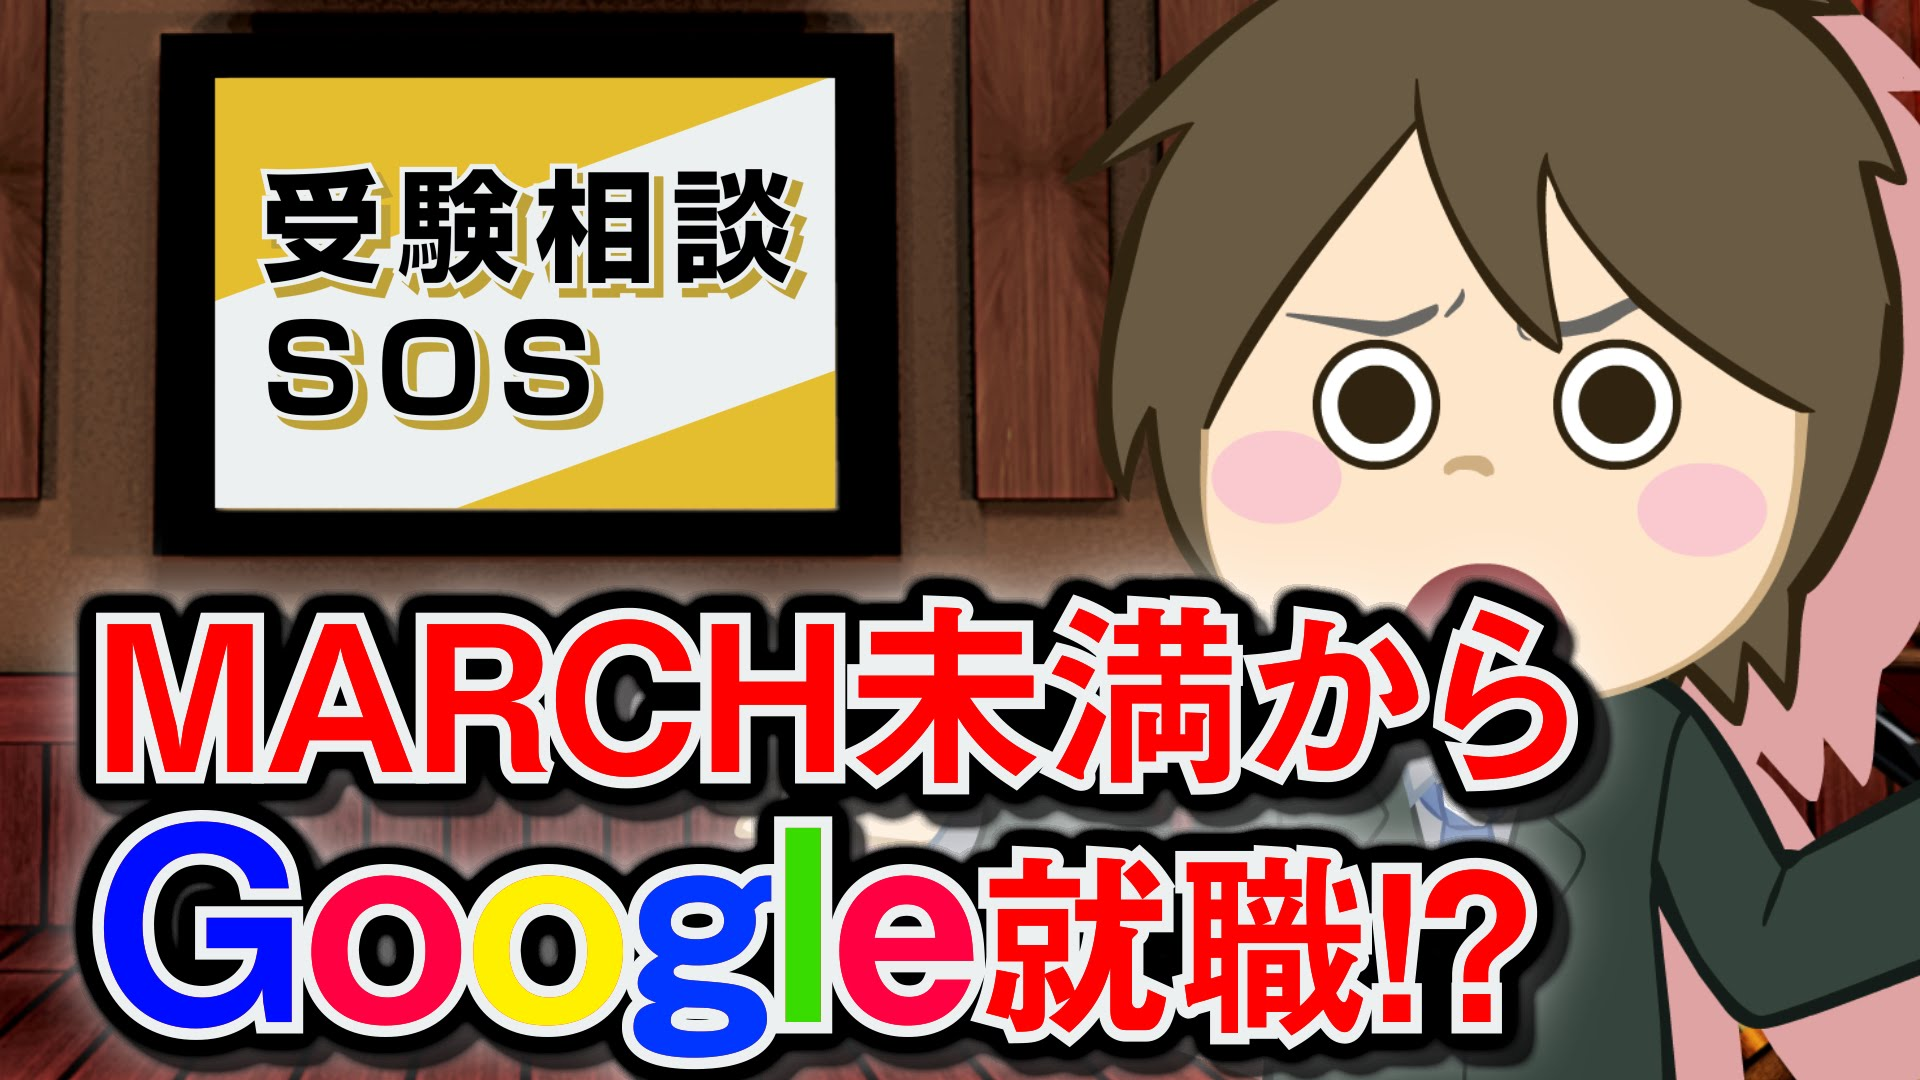 【vol.44】MARCH未満からGoogle就職!?|受験相談SOS